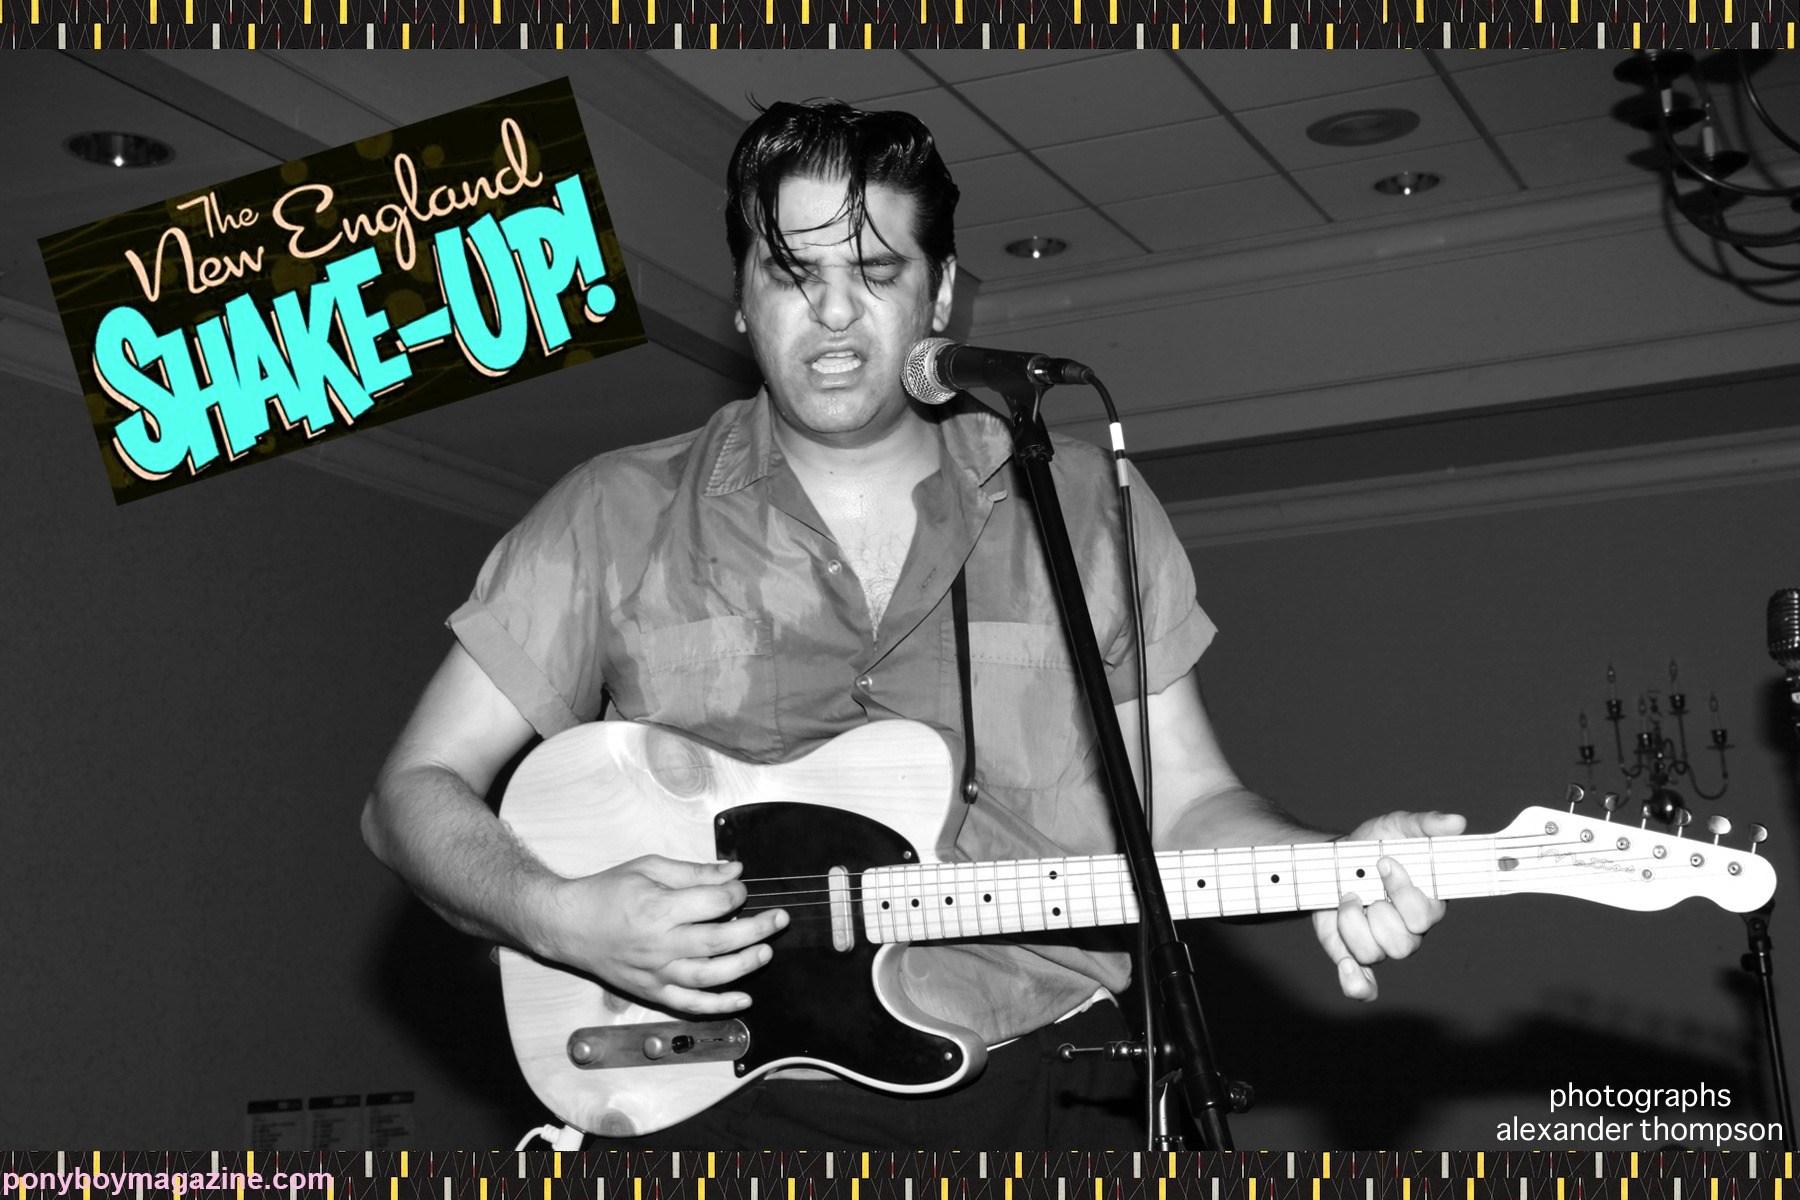 Rockabilly legend Bloodshot Bill live at The New England Shake-up, photographed by Alexander Thompson for Ponyboy Magazine.